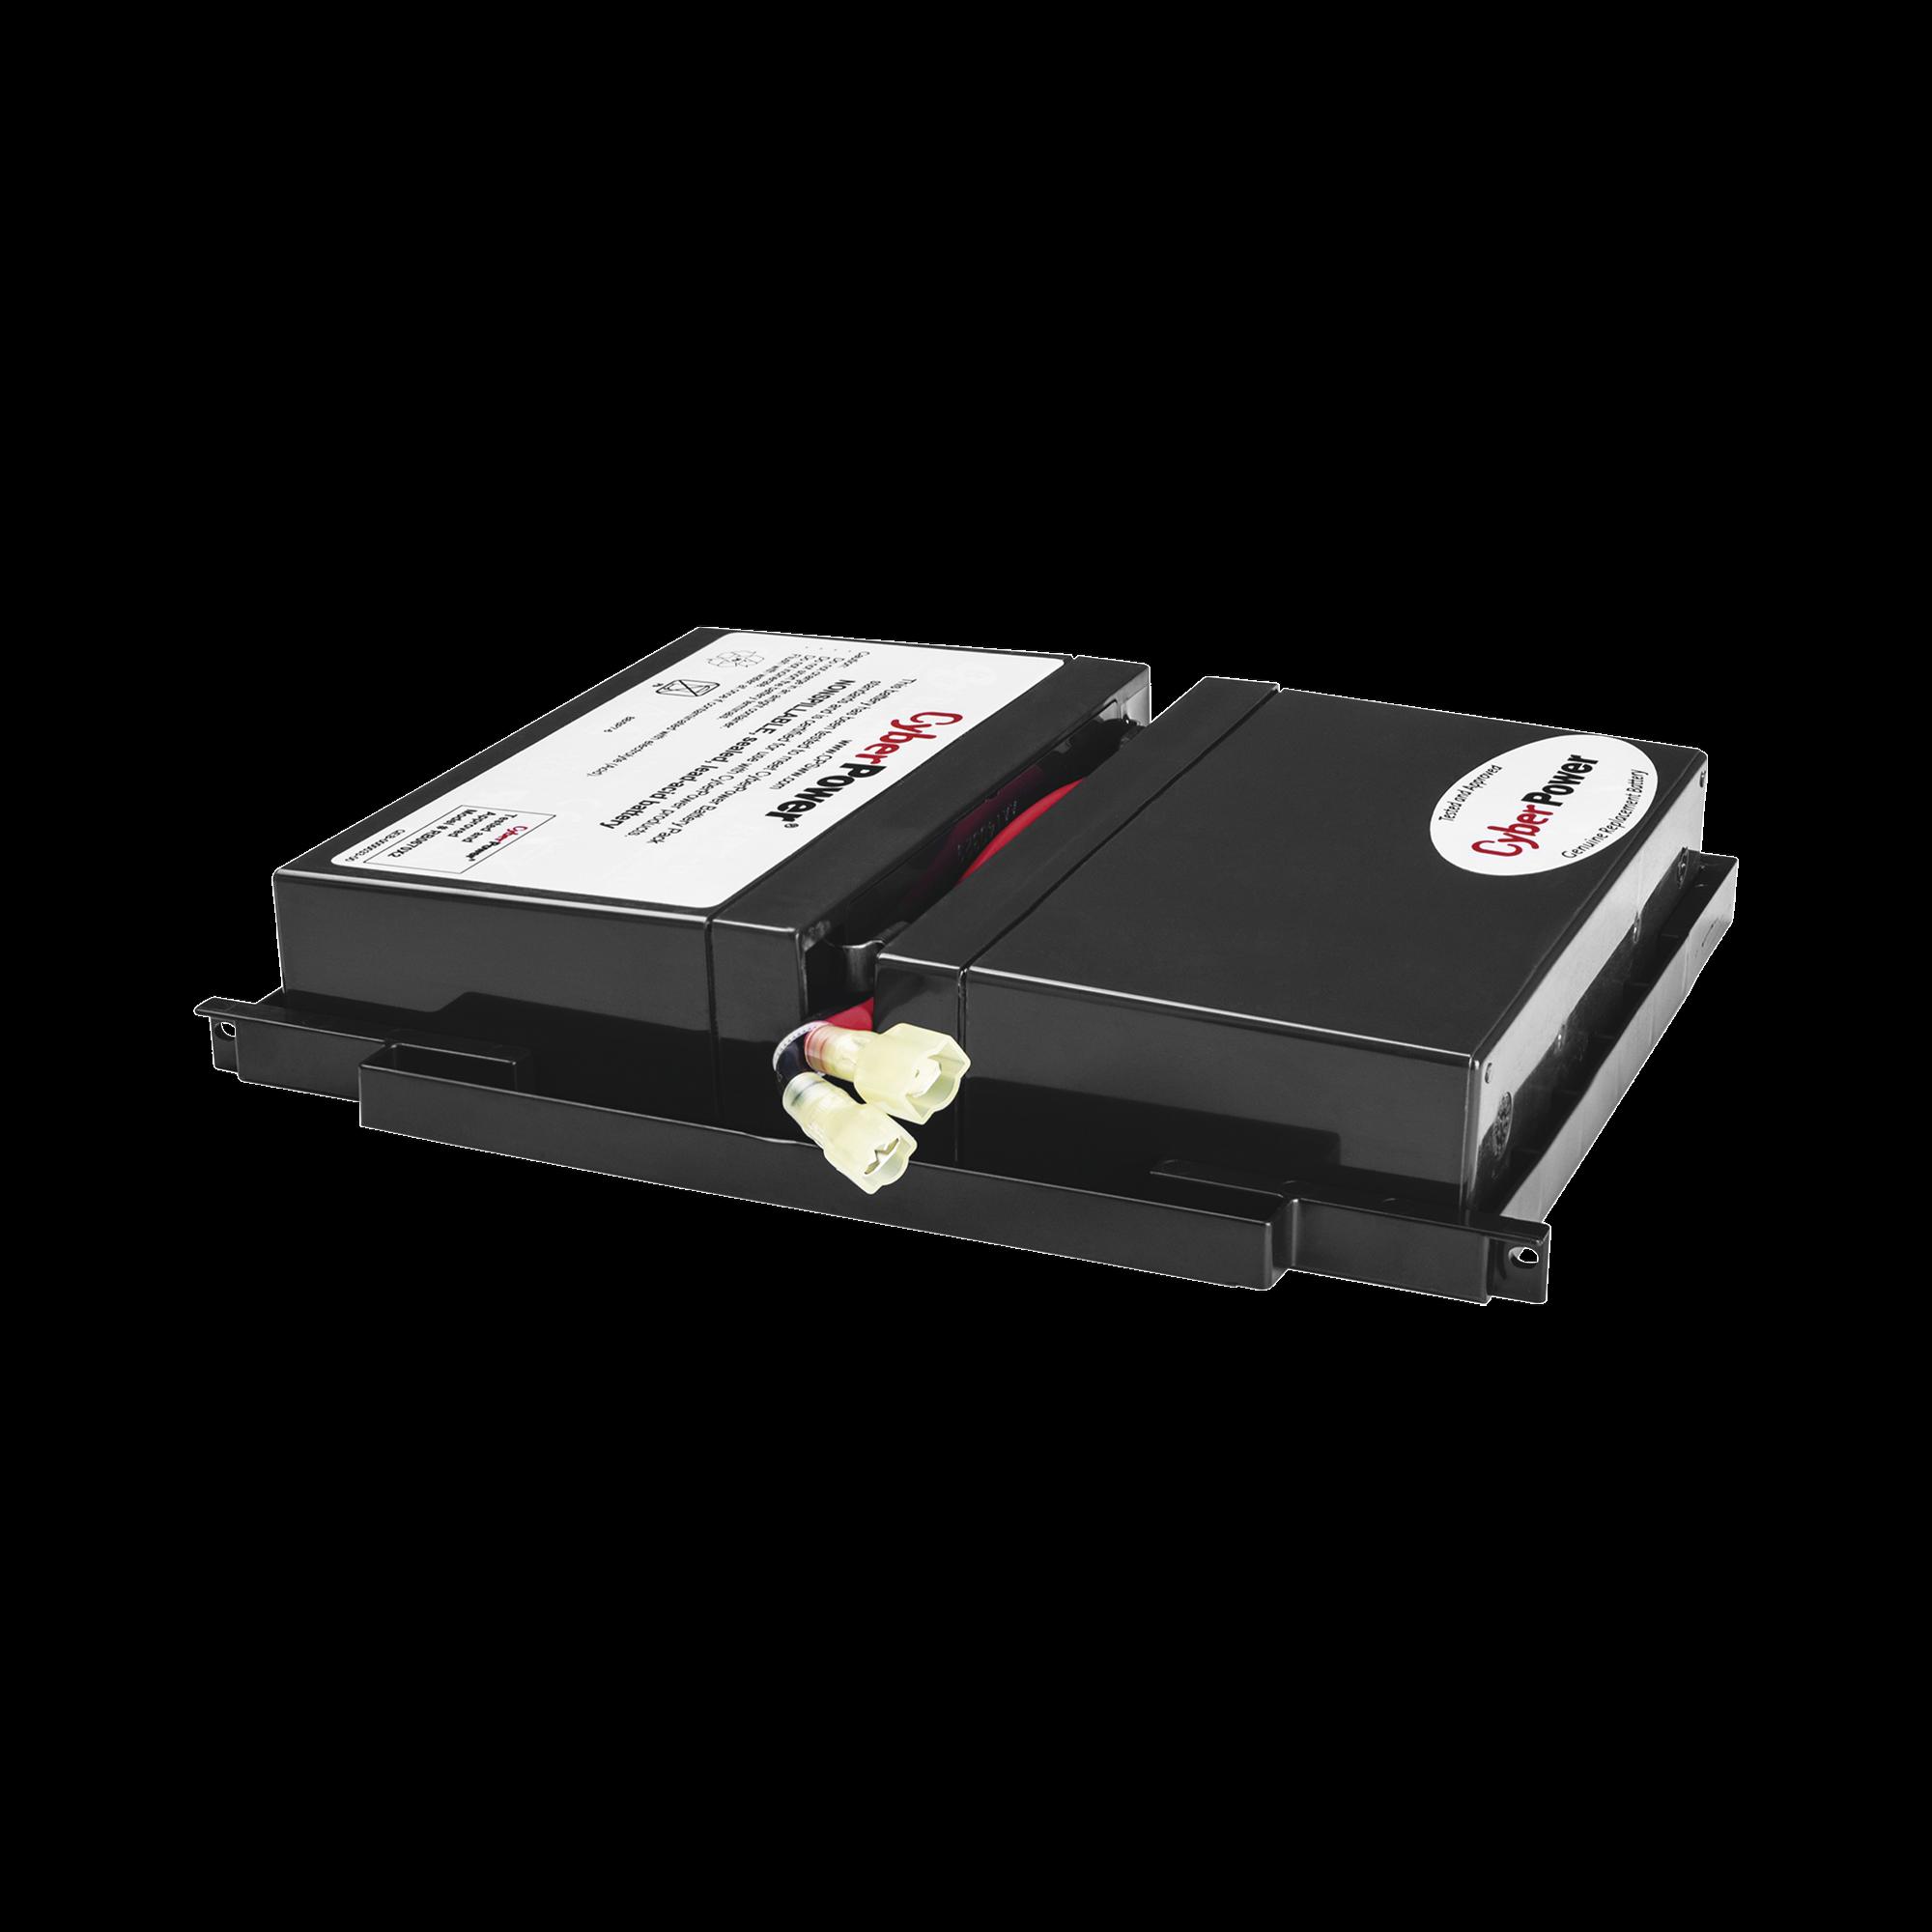 Kit de 2 Baterías Remplazo de  6V/7Ah, Para UPS OR500LCDRM1U